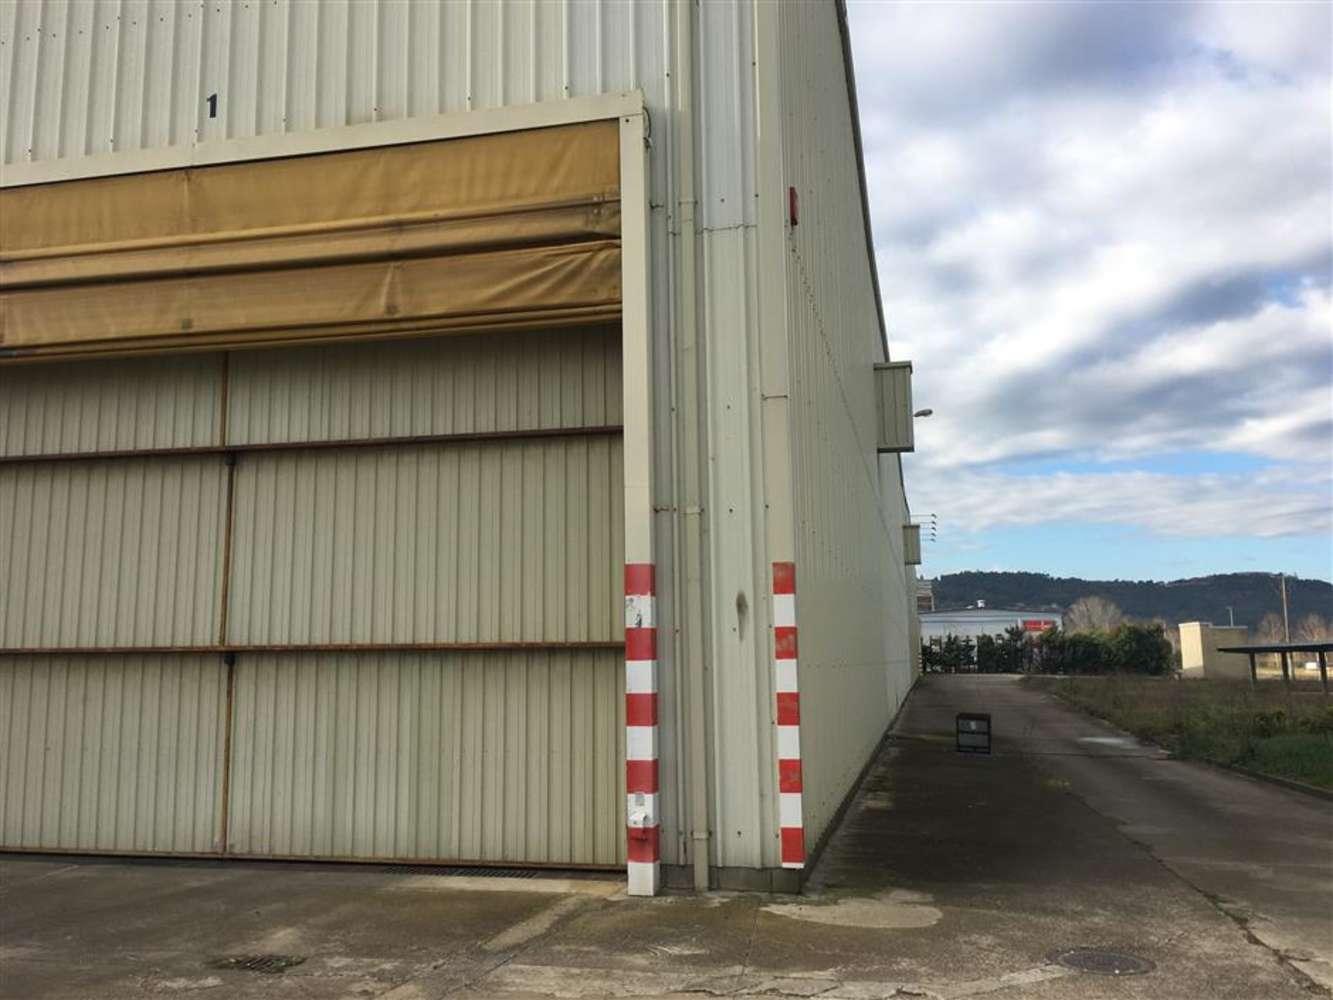 Naves industriales y logísticas Celrà, 17460 - Nave Industrial - B0455 - P.I CELRÀ - 9383